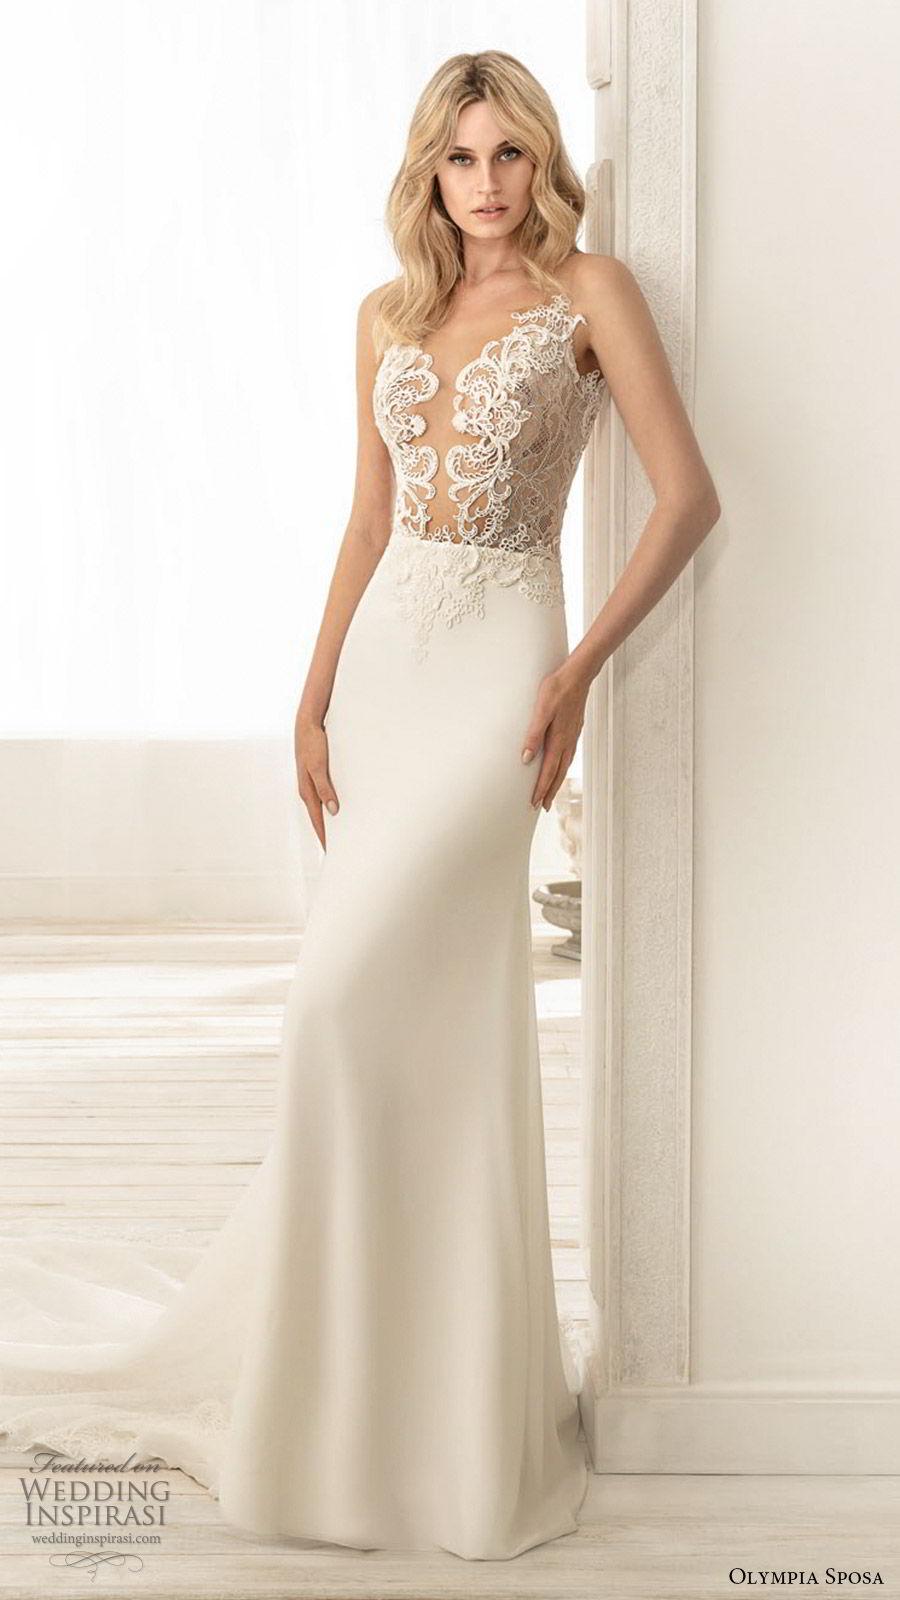 olympia sposa 2020 bridal sleeveless illusion straps plunging v neckline sheer embellished bodice sheath wedding dress (6) elegant sexy low back chapel train mv